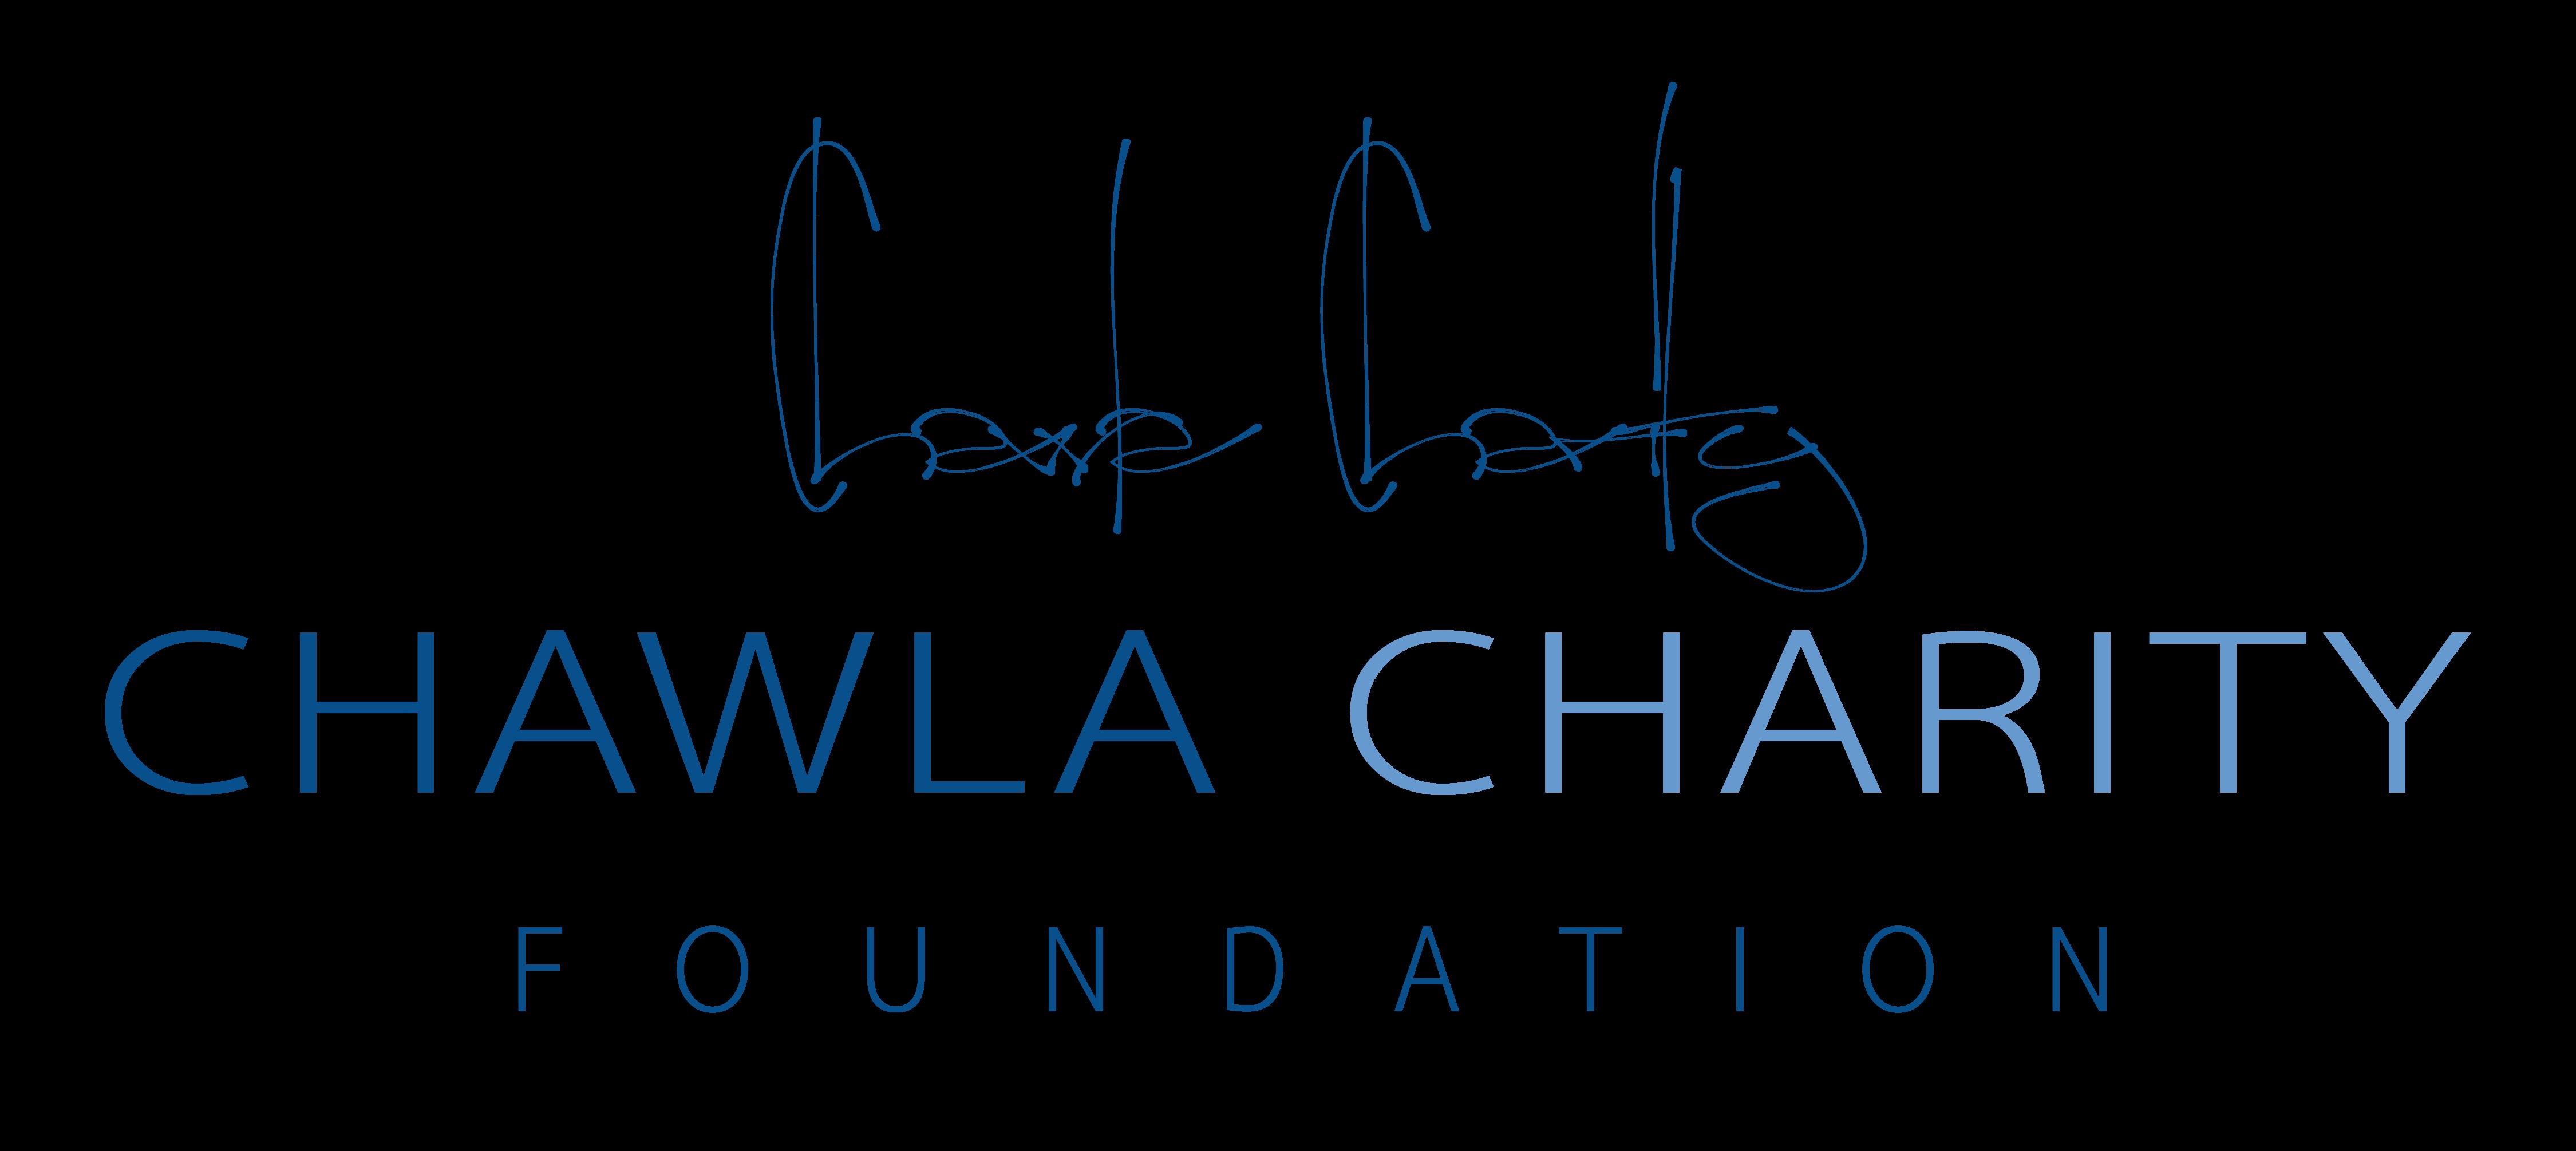 Chawla Charity Foundation